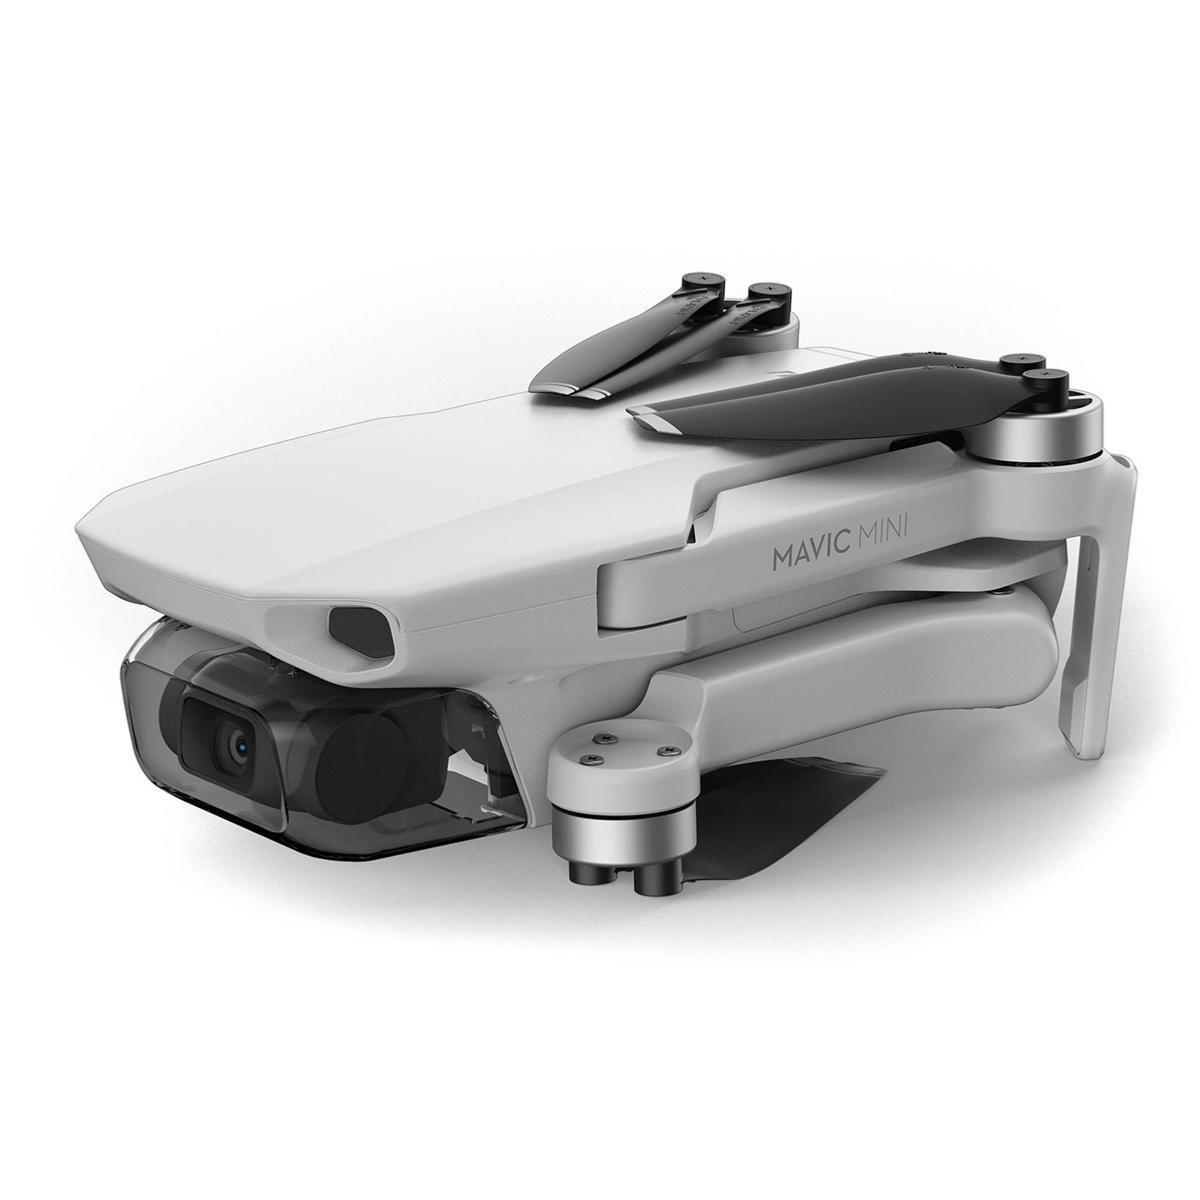 Dji Drone Mavic Mini Fly More Combo - Prophot